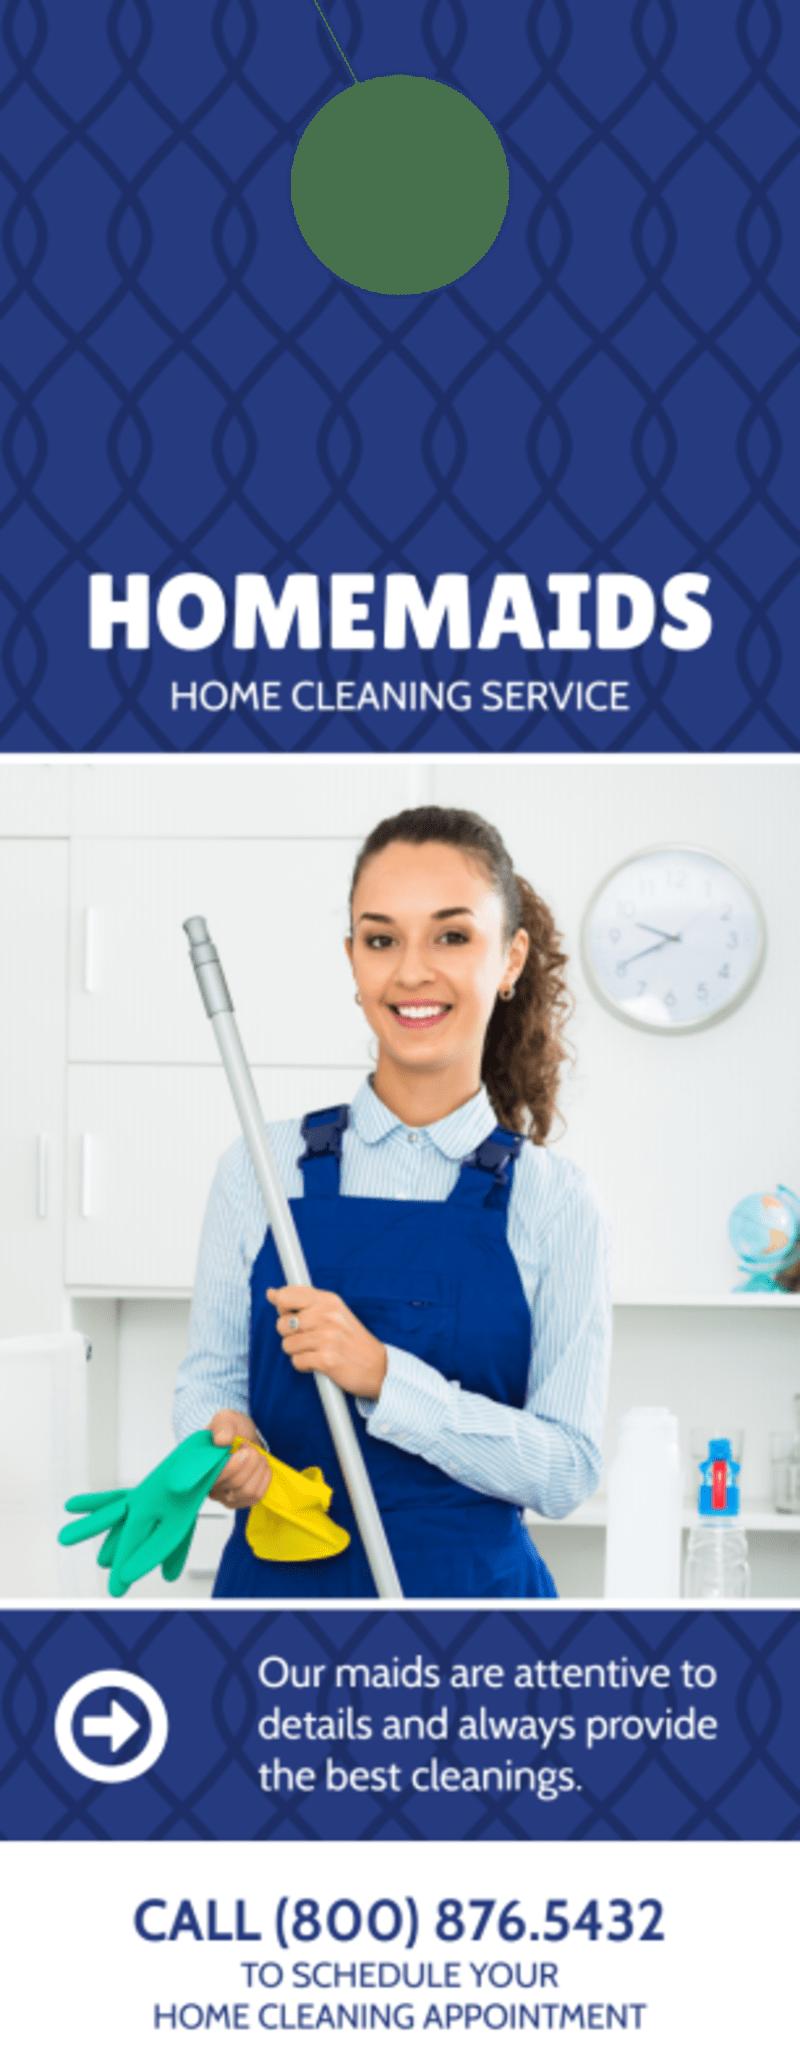 Homemaids Cleaning Service Door Hanger Template Preview 2